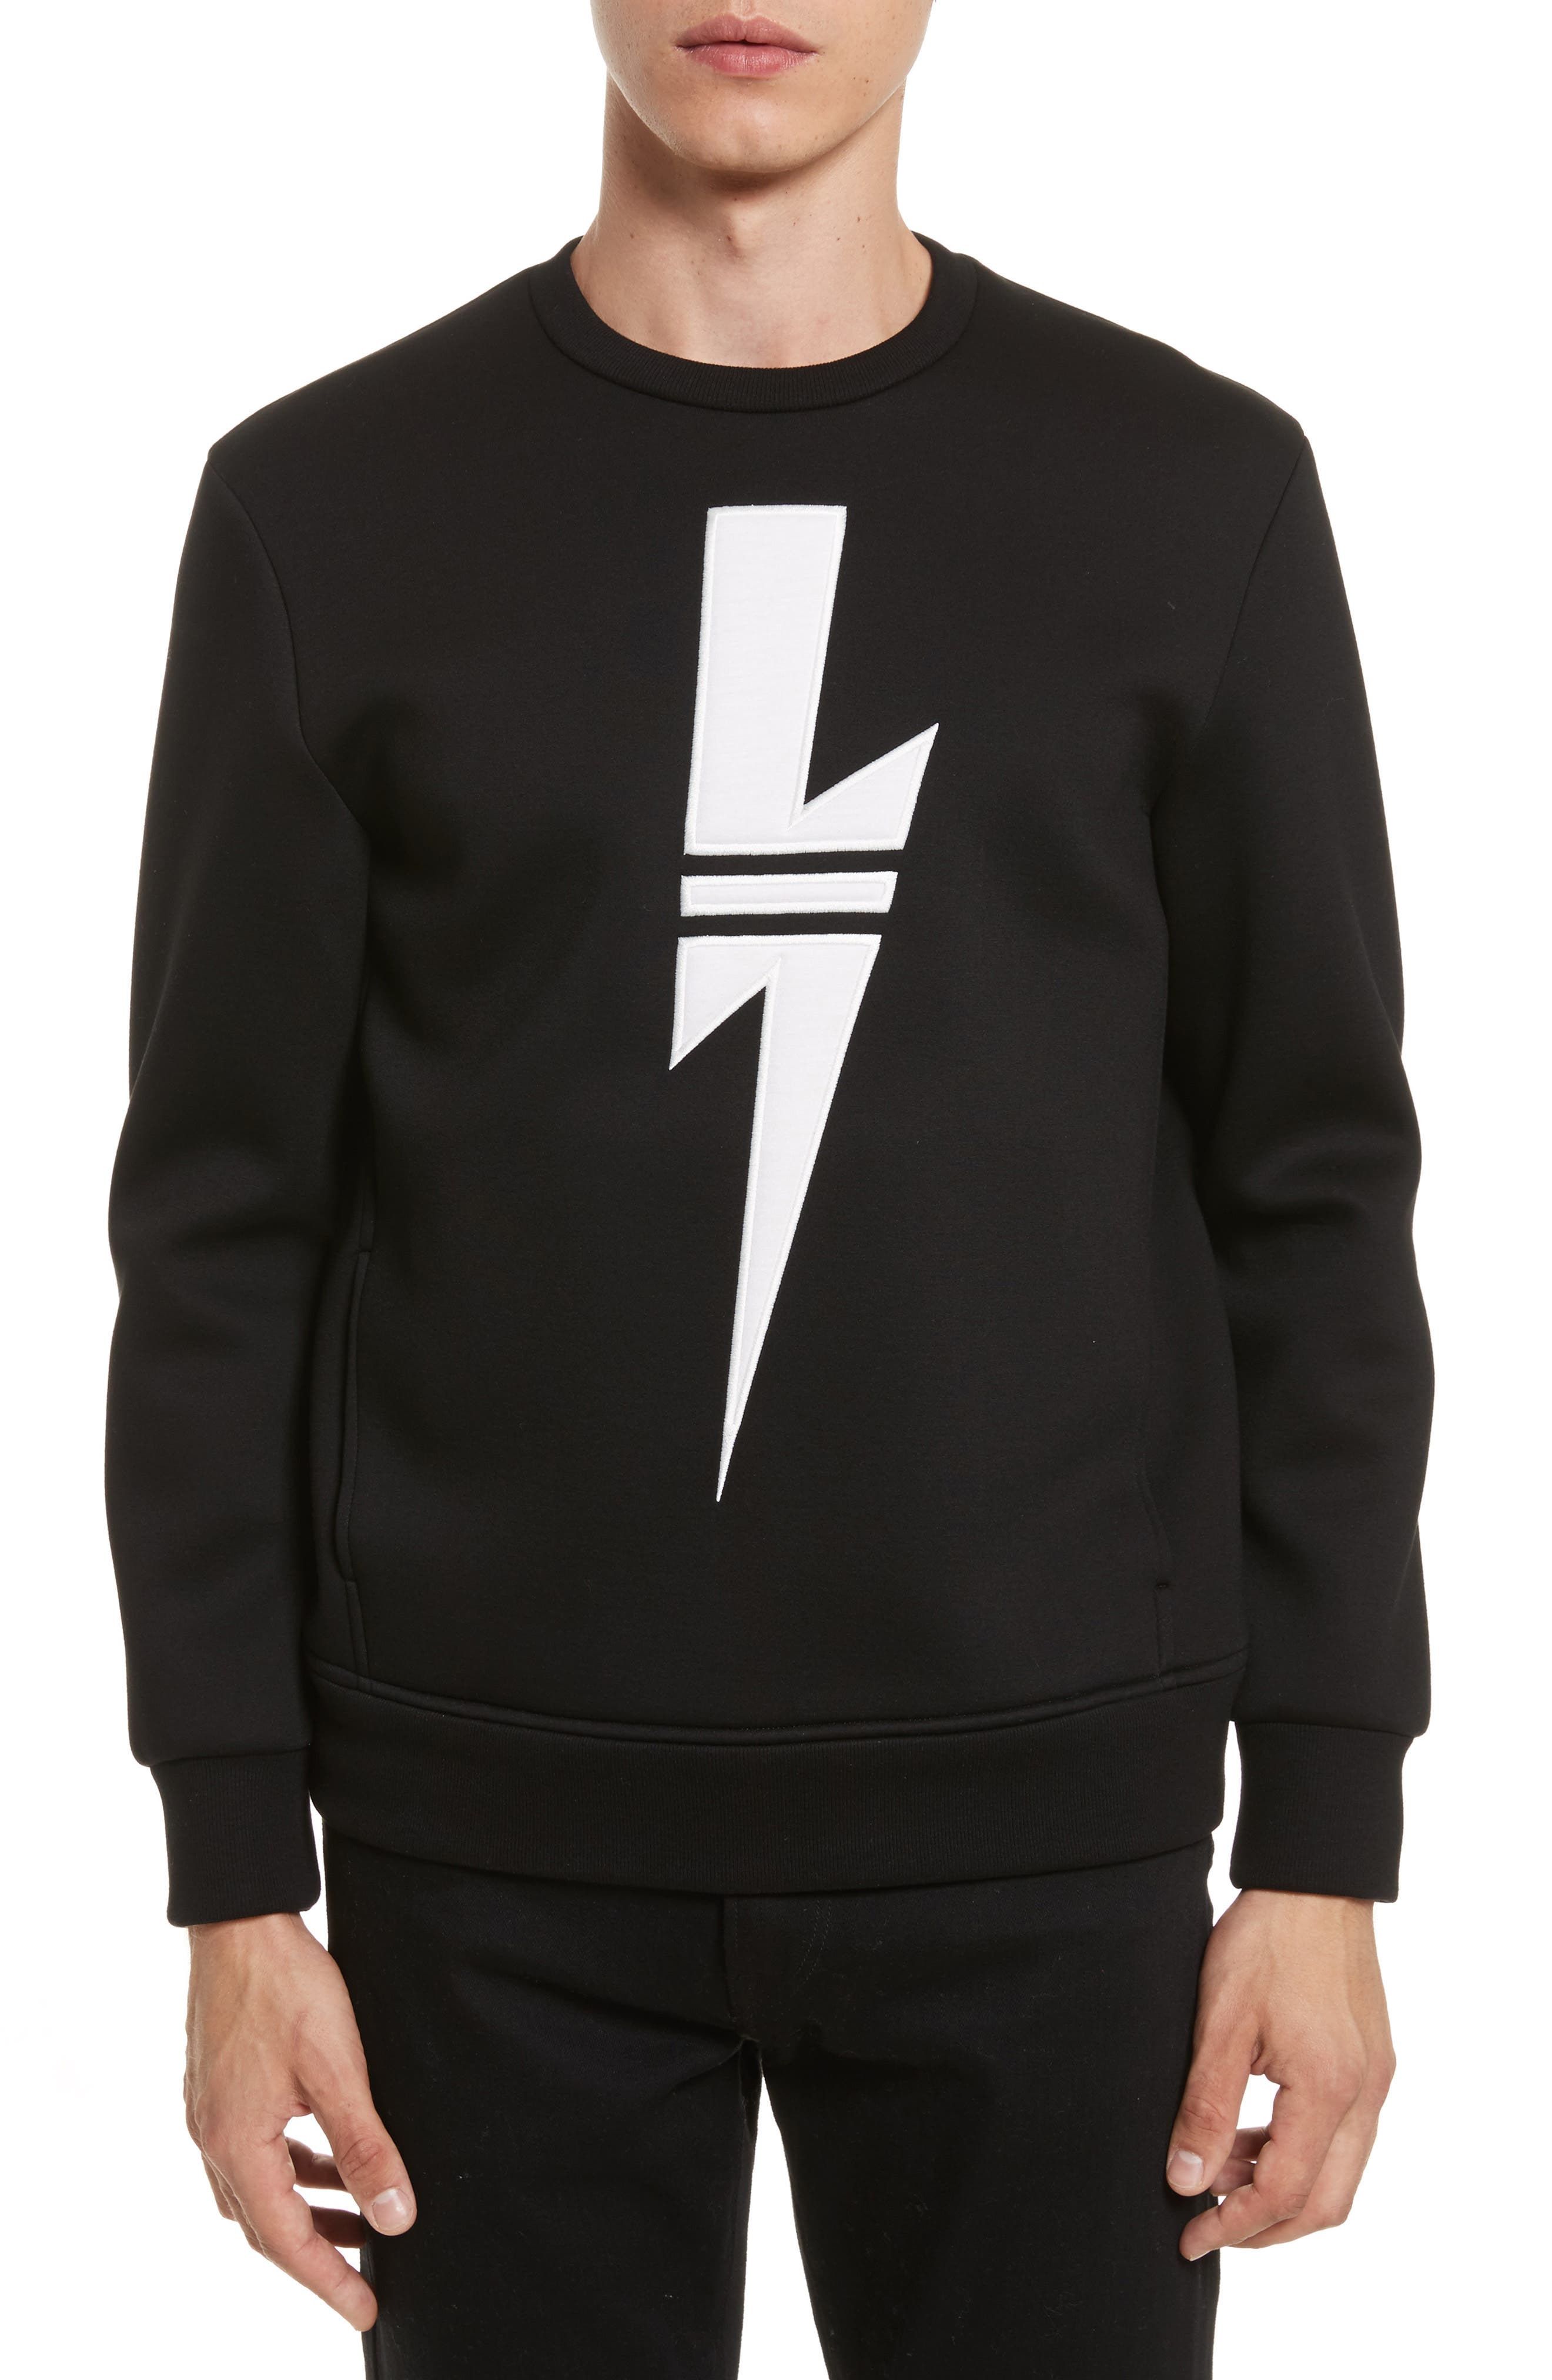 New Thunderbolt Sweatshirt,                         Main,                         color, Black/ Off White